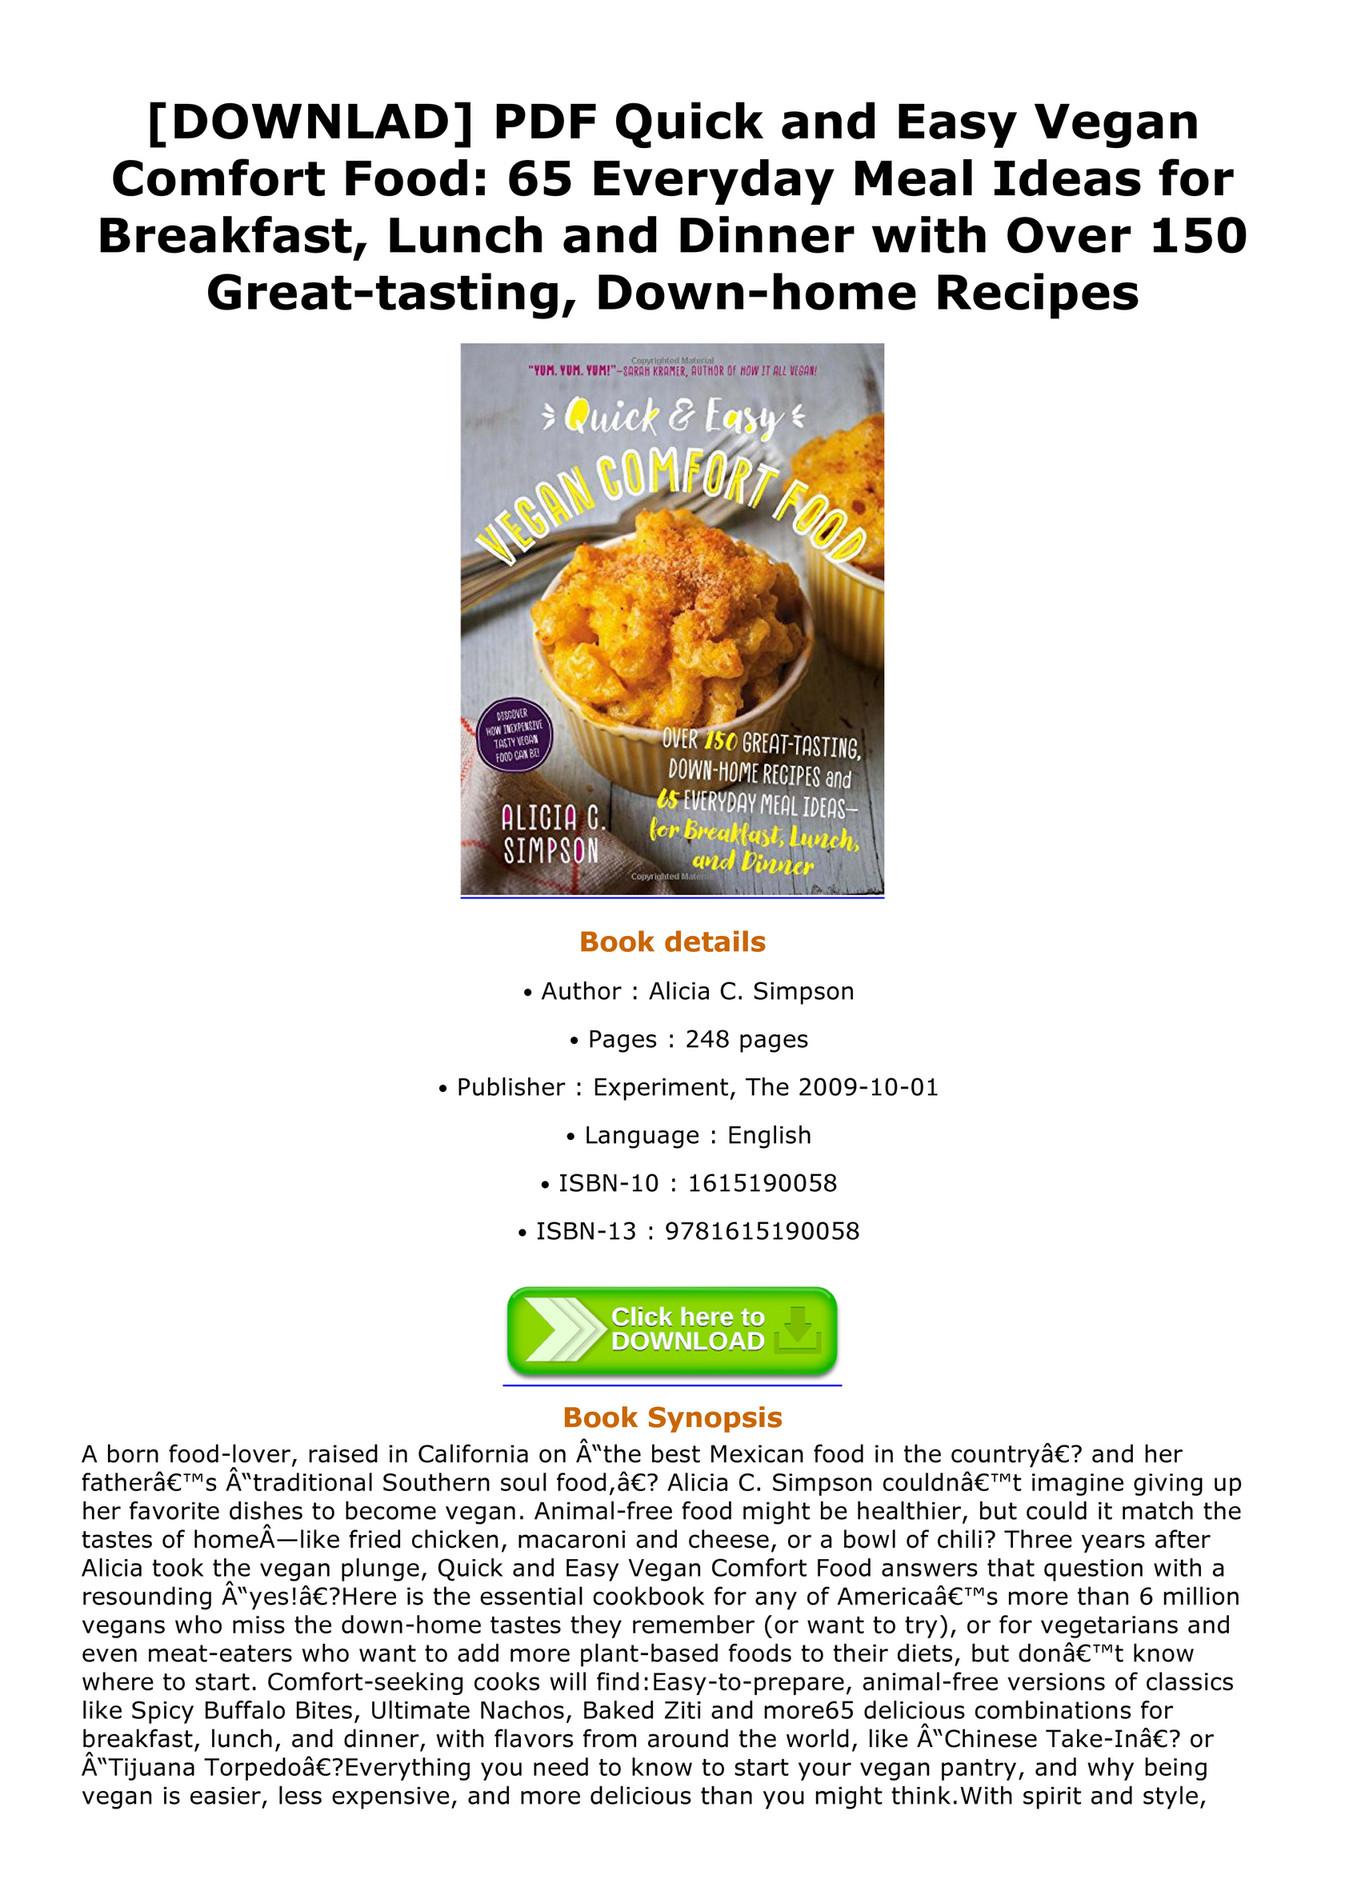 Westberg - DOWNLAD PDF Quick and Easy Vegan Comfort Food 65 Everyday ...